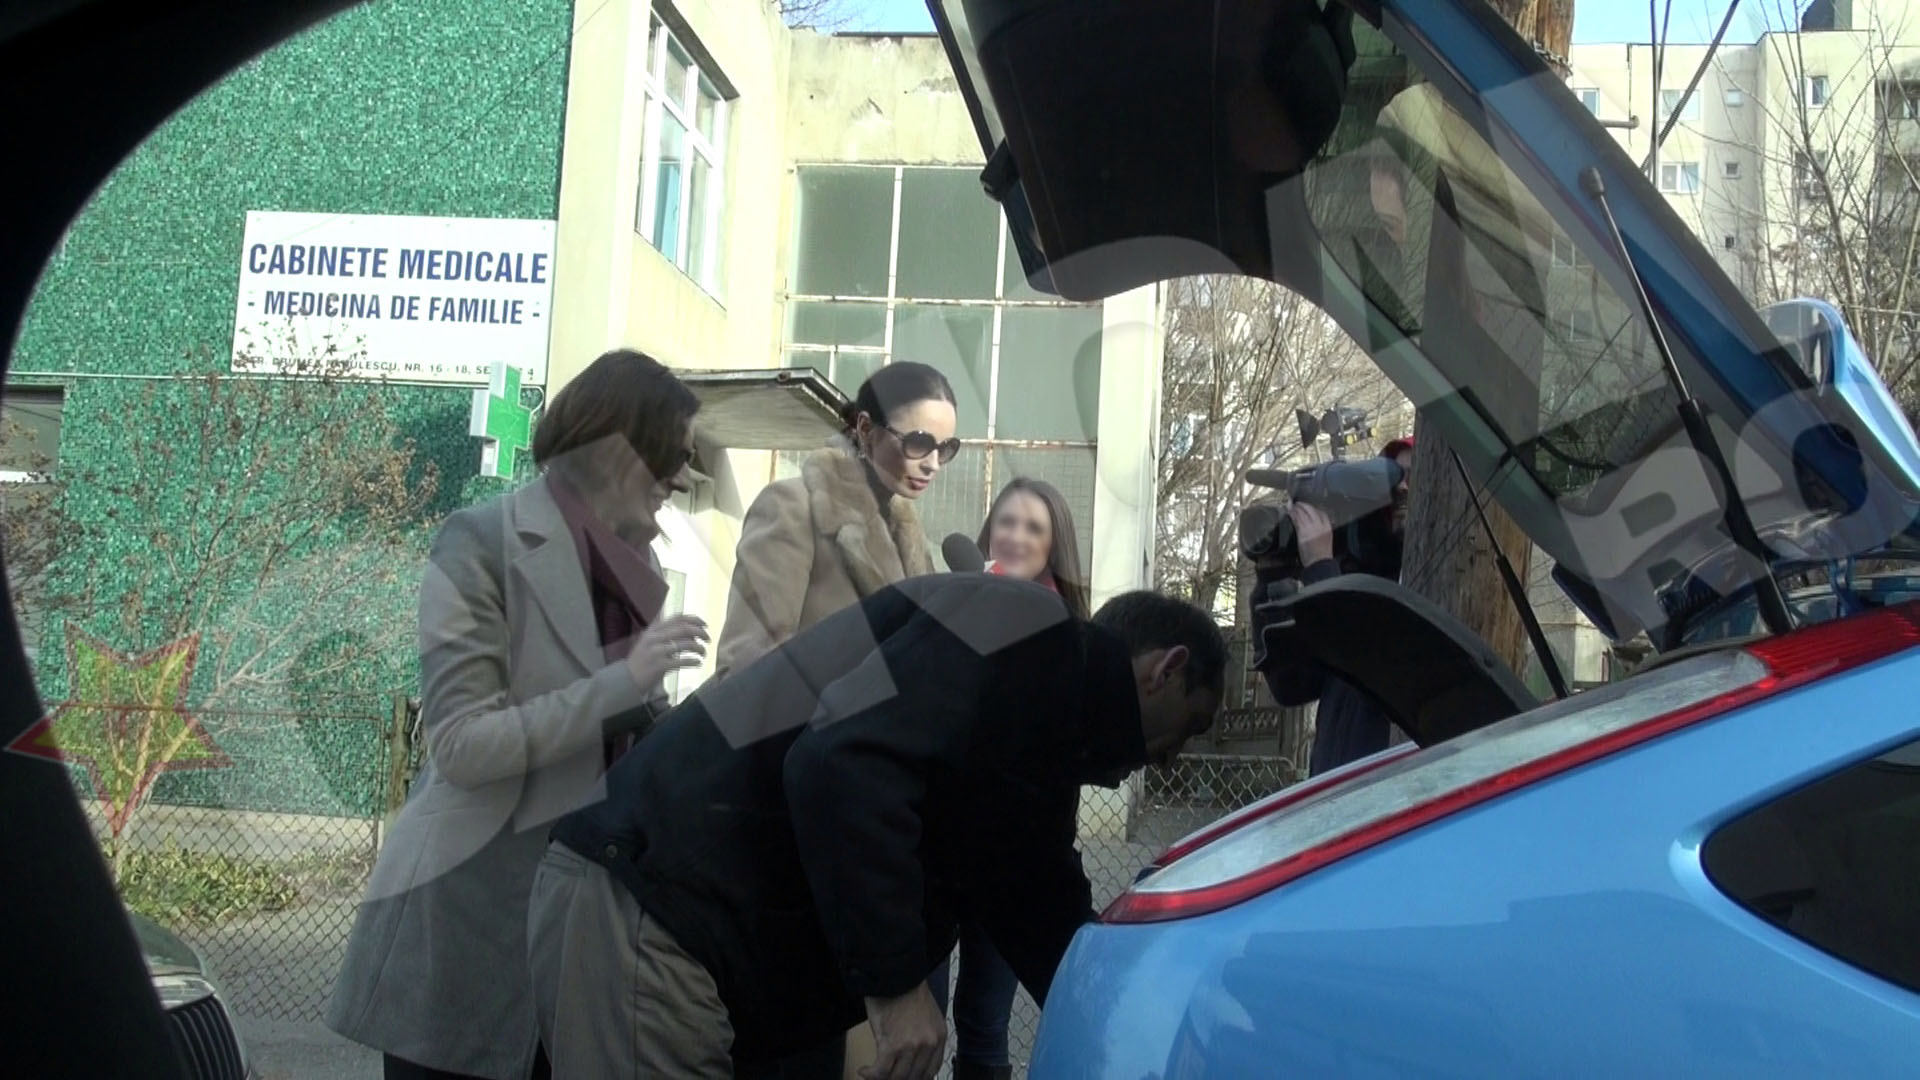 Andreea si colaboratorii sai au golit portbagajul plin cu daruri